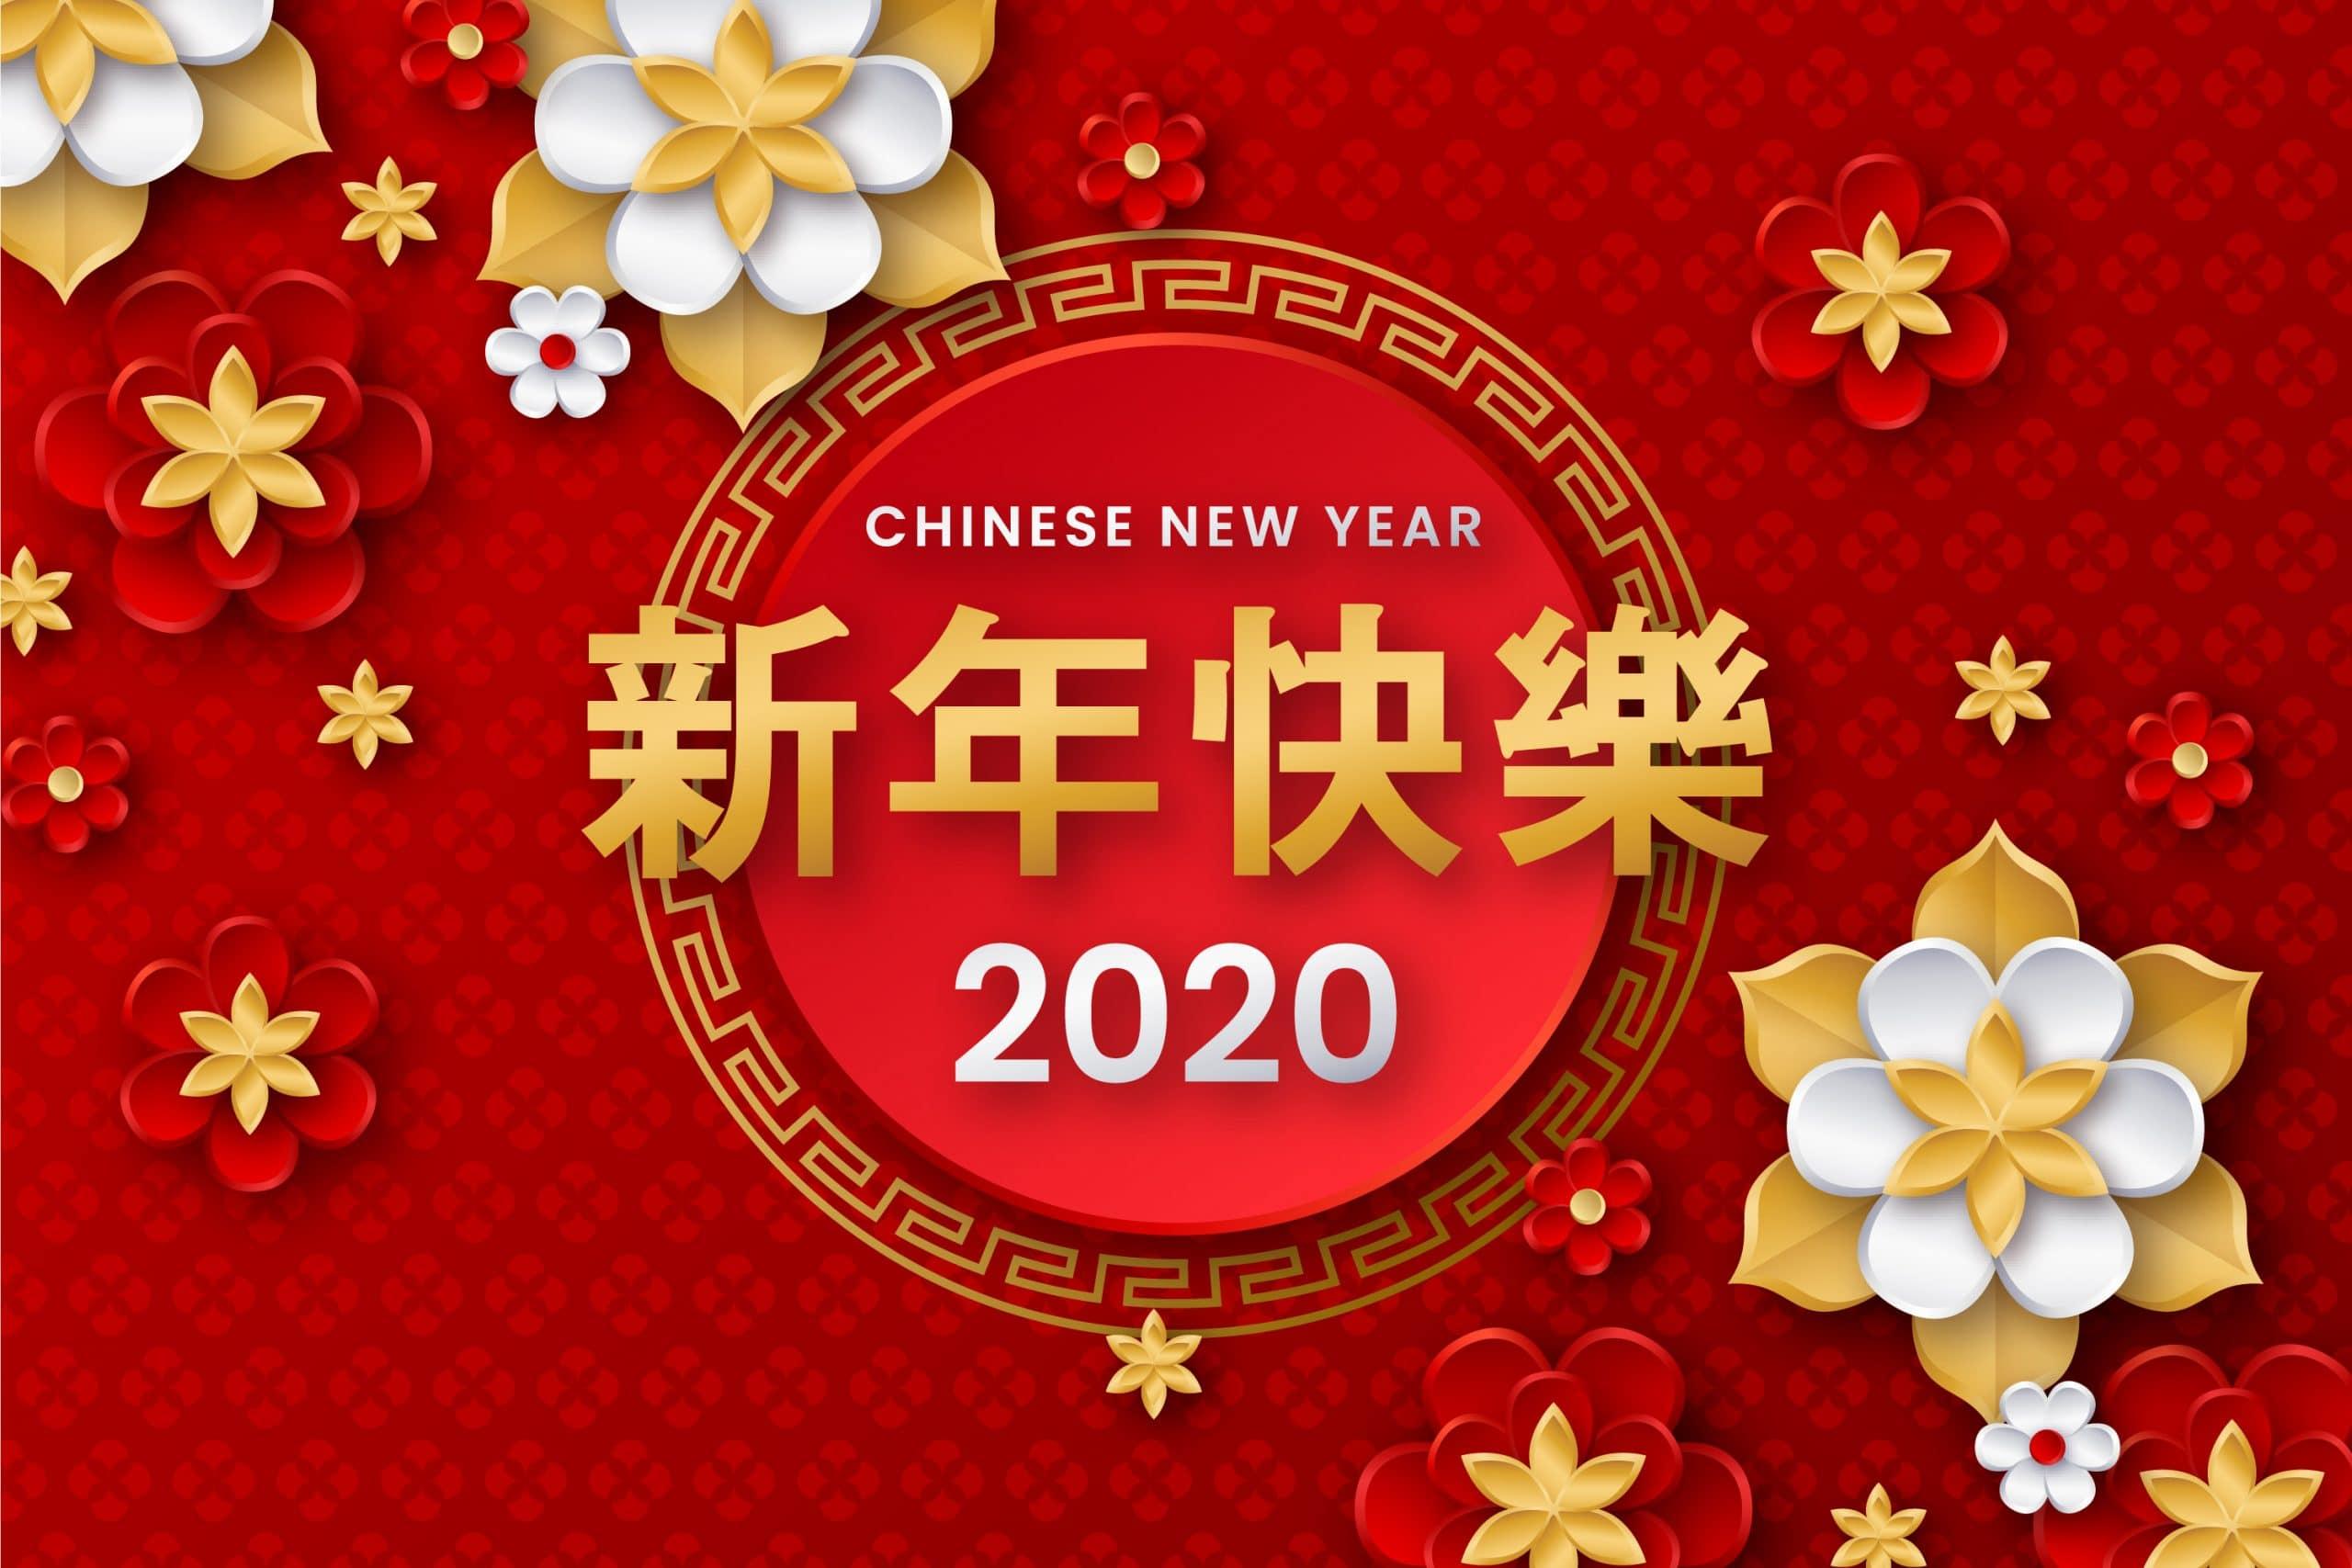 2020 lunar new year image